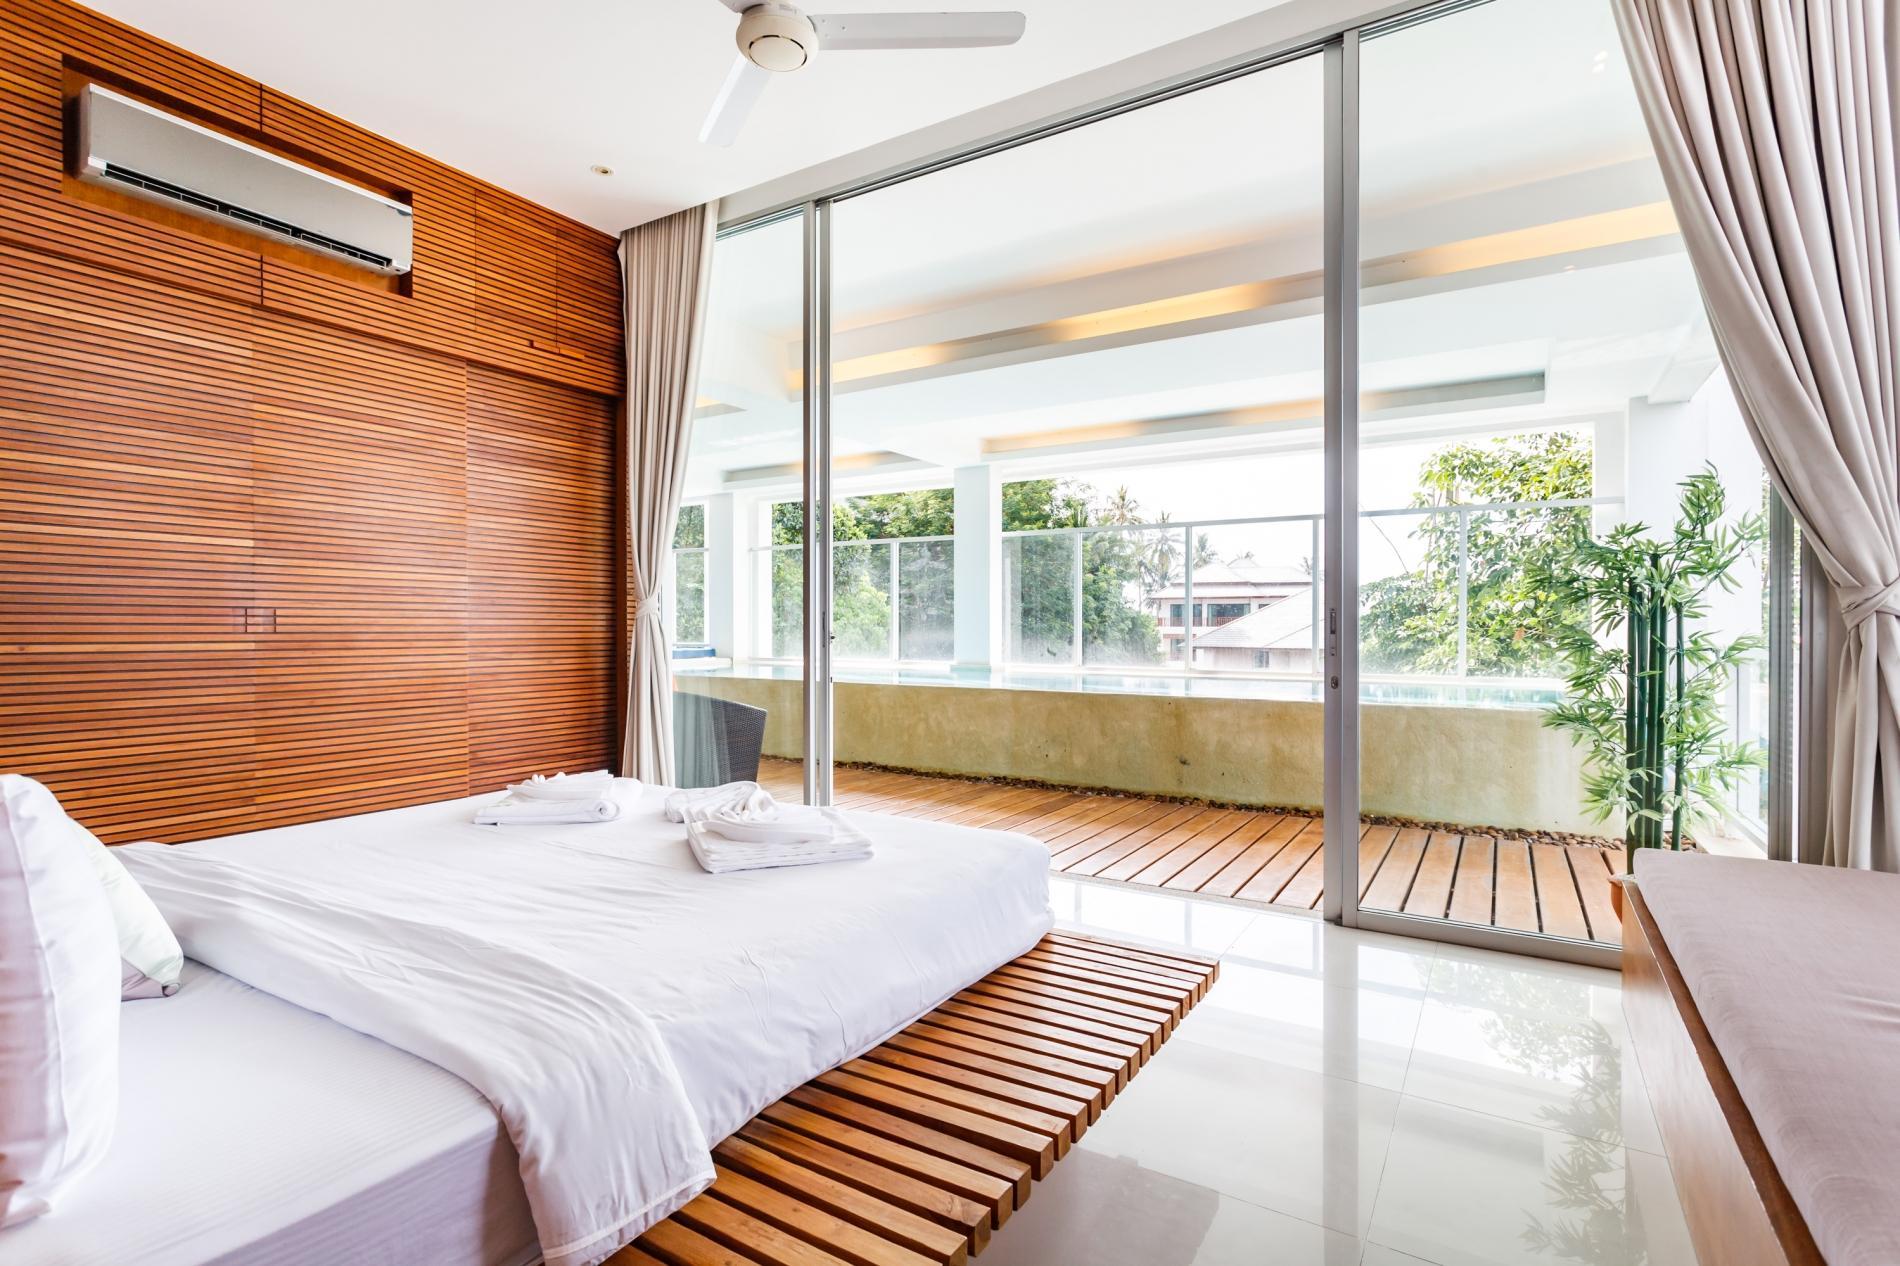 Apartment The Quarter 301 - Luxury Surin 3 bedroom apartment private pool photo 20176520